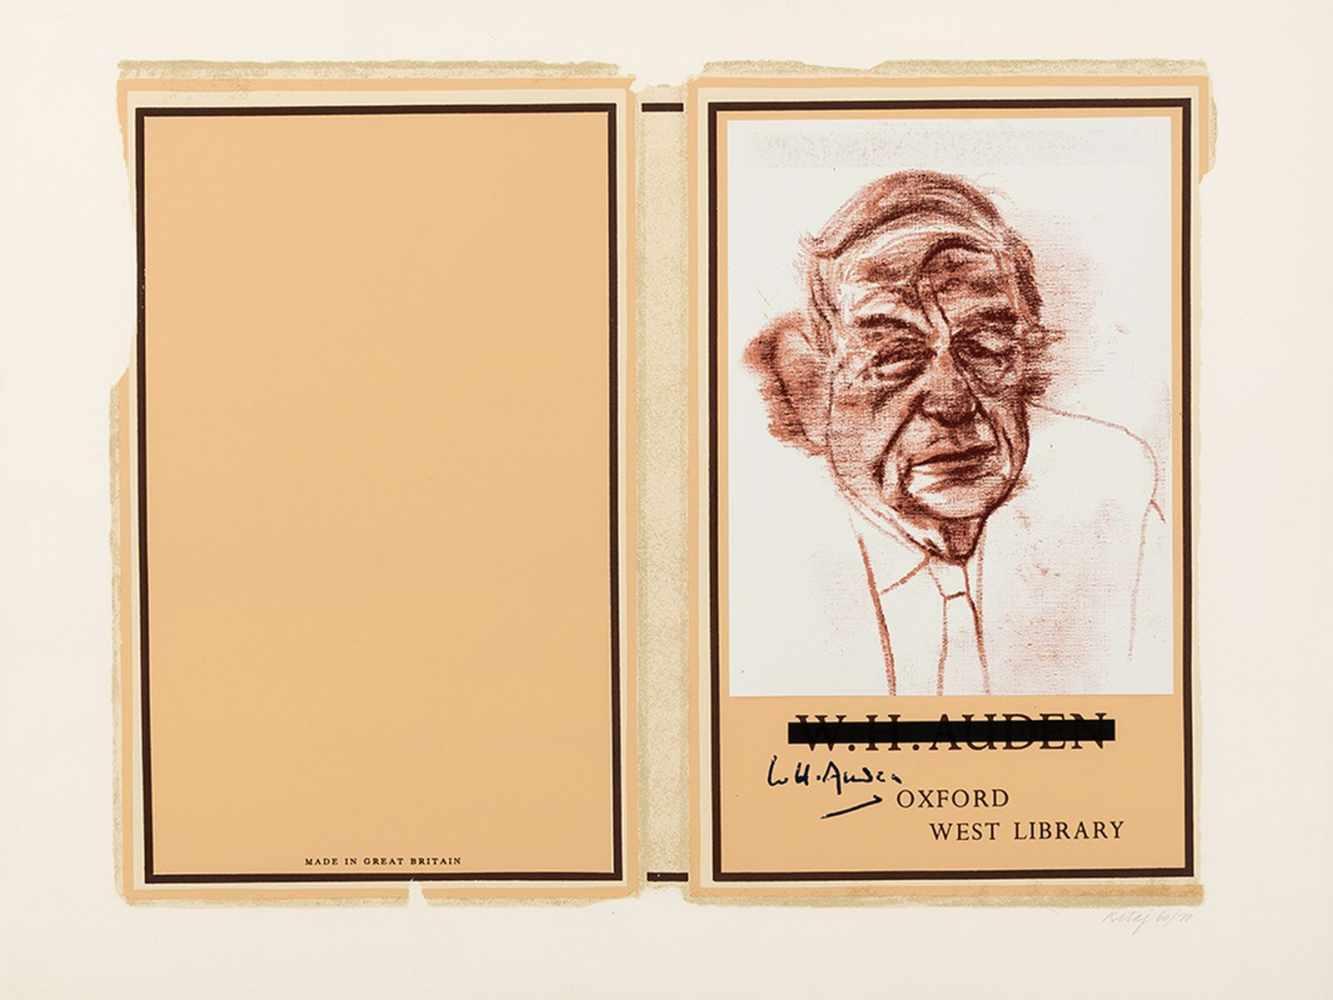 R.B. Kitaj (1887-1948), W.H. Auden, Color Serigraph, 1969 - Image 3 of 10